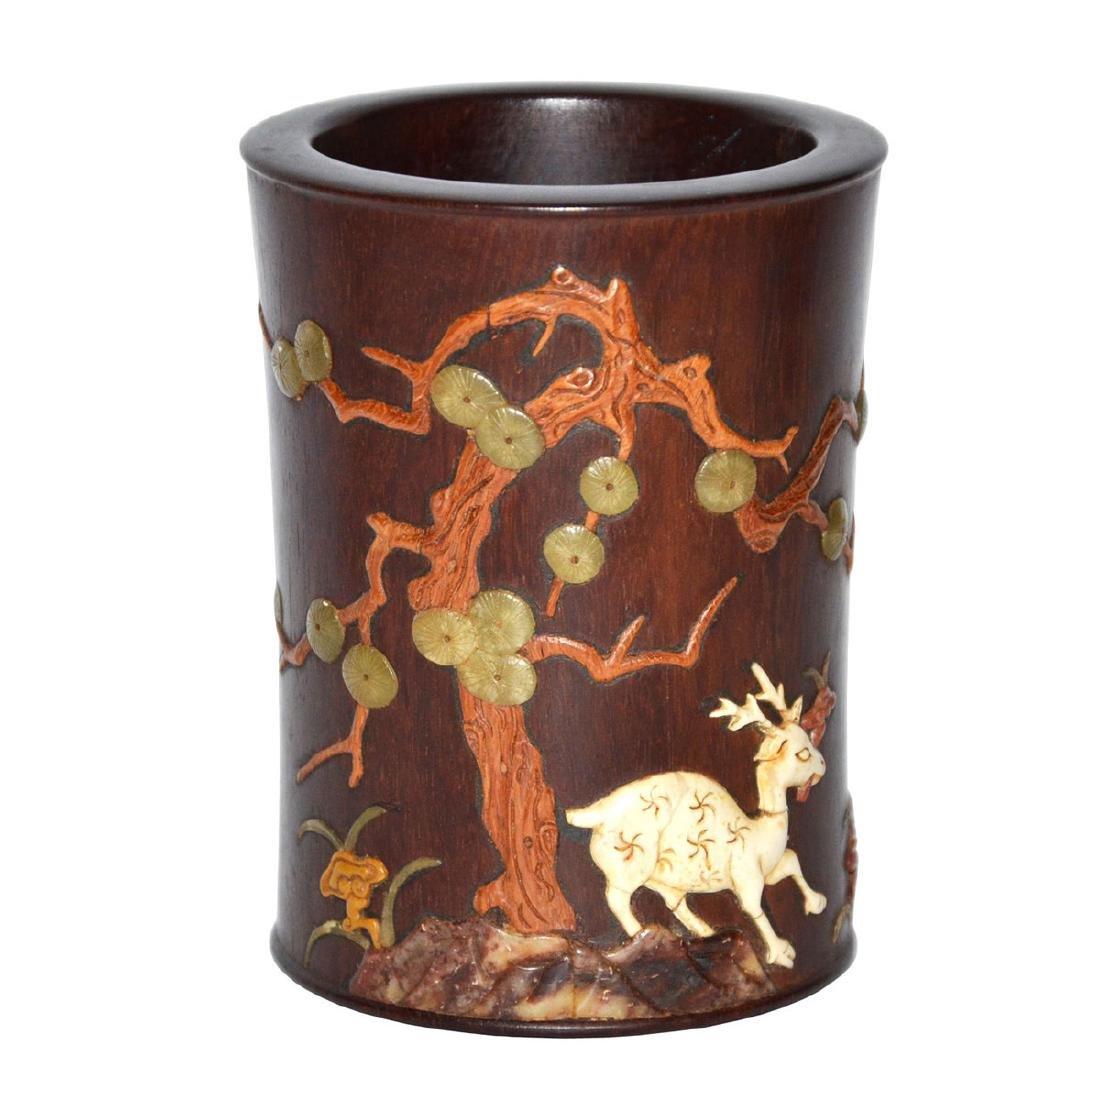 Huanghuali Brush Pot Embellished with Deer and Lingzhi